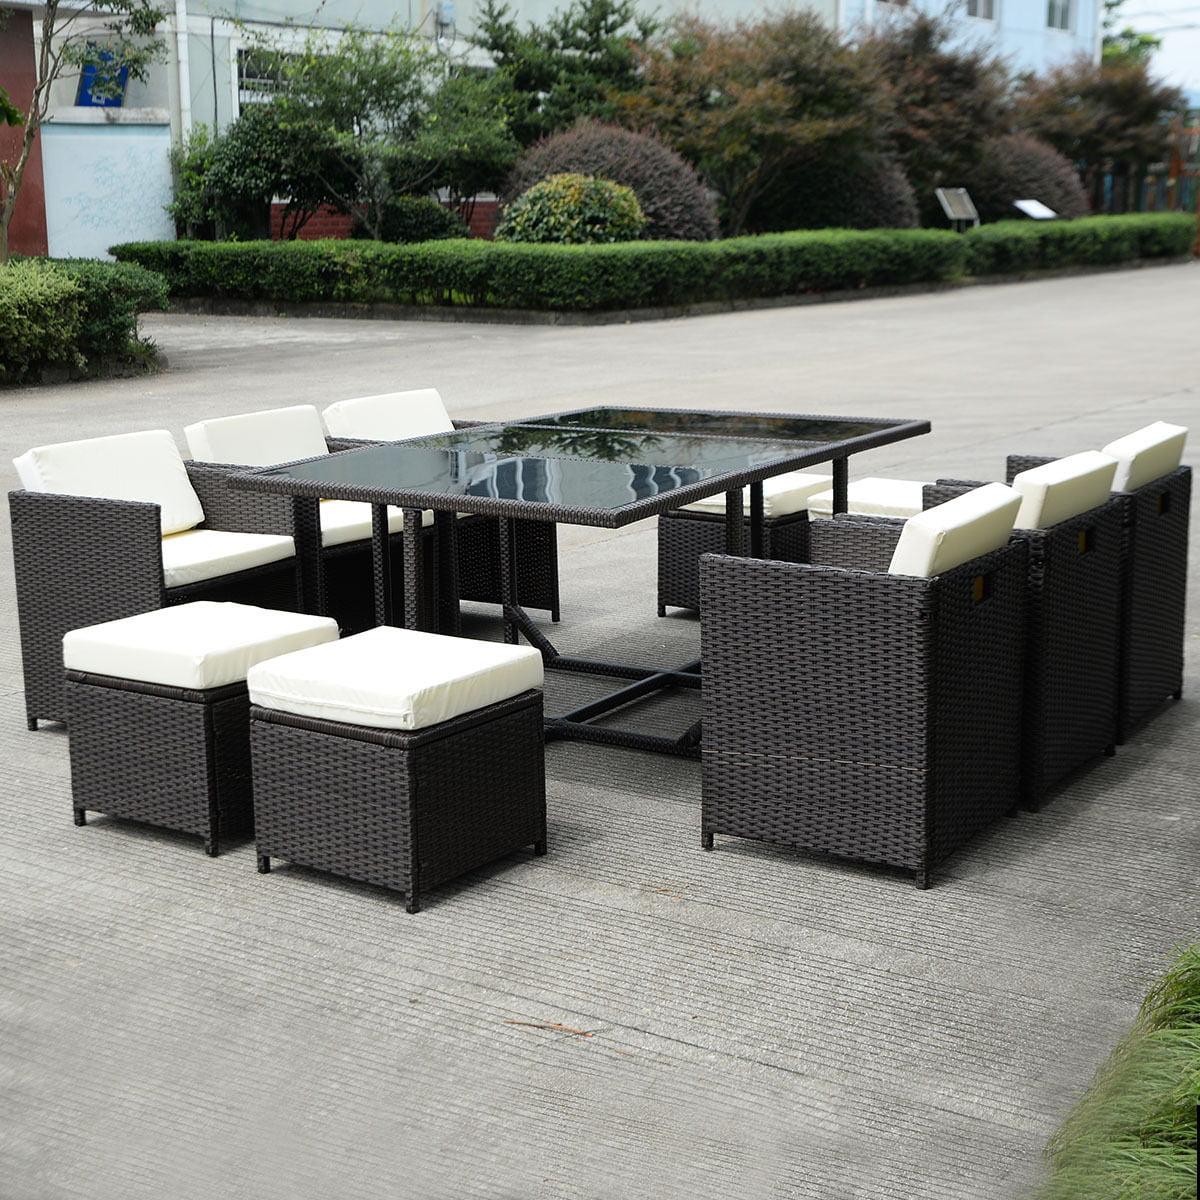 Costway 11 PCS Outdoor Patio Dining Set Metal Rattan Wicker Furniture  Garden Cushioned   Walmart.com